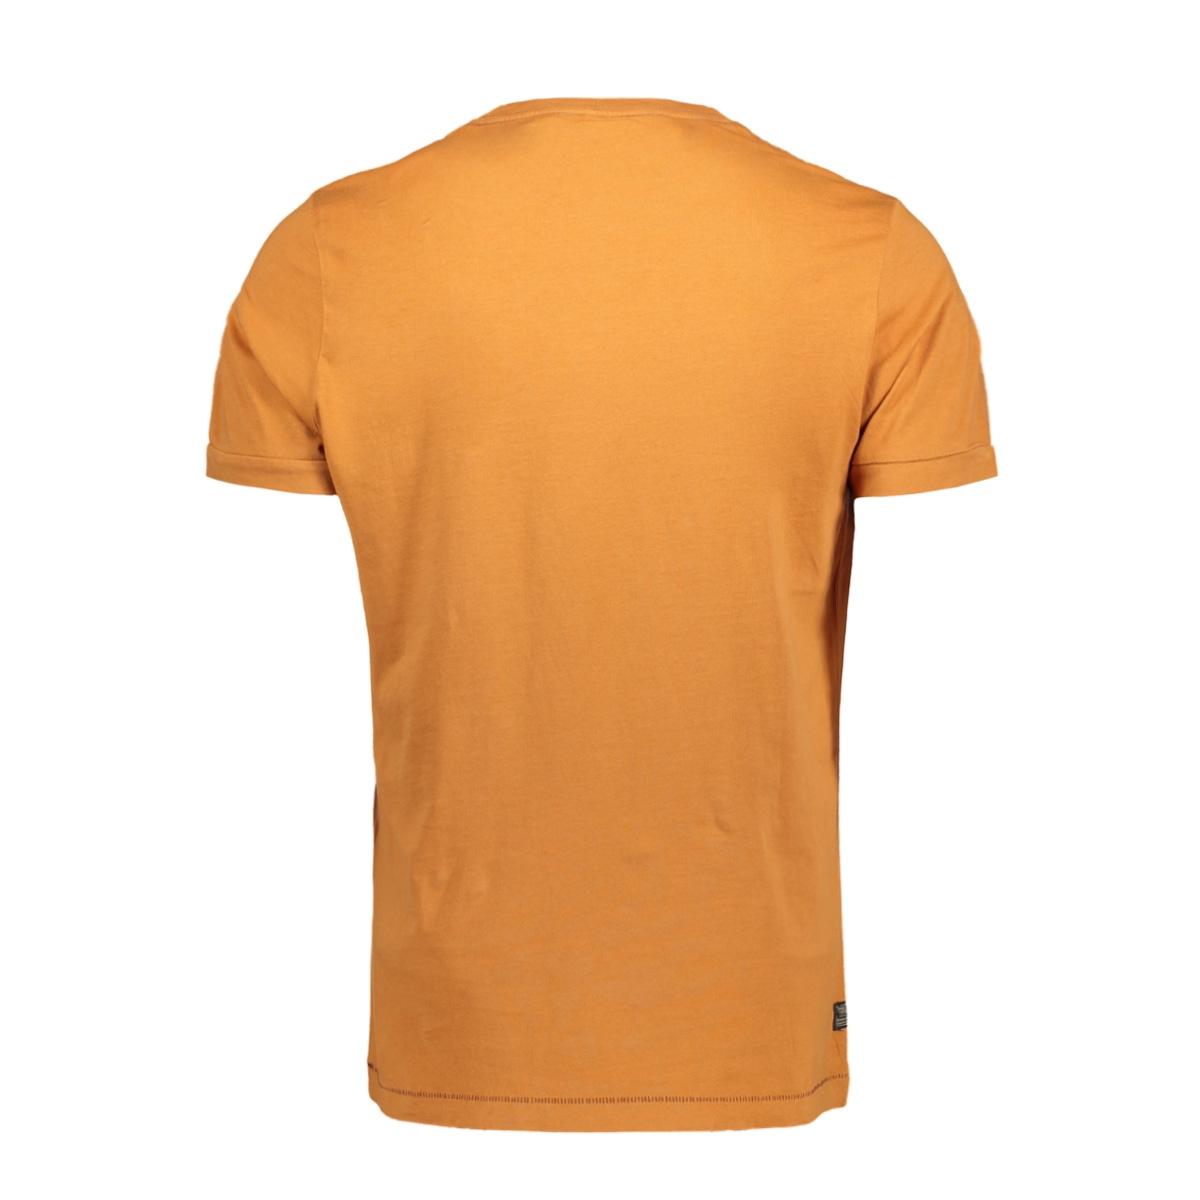 ptss176546 pme legend t-shirt 1041